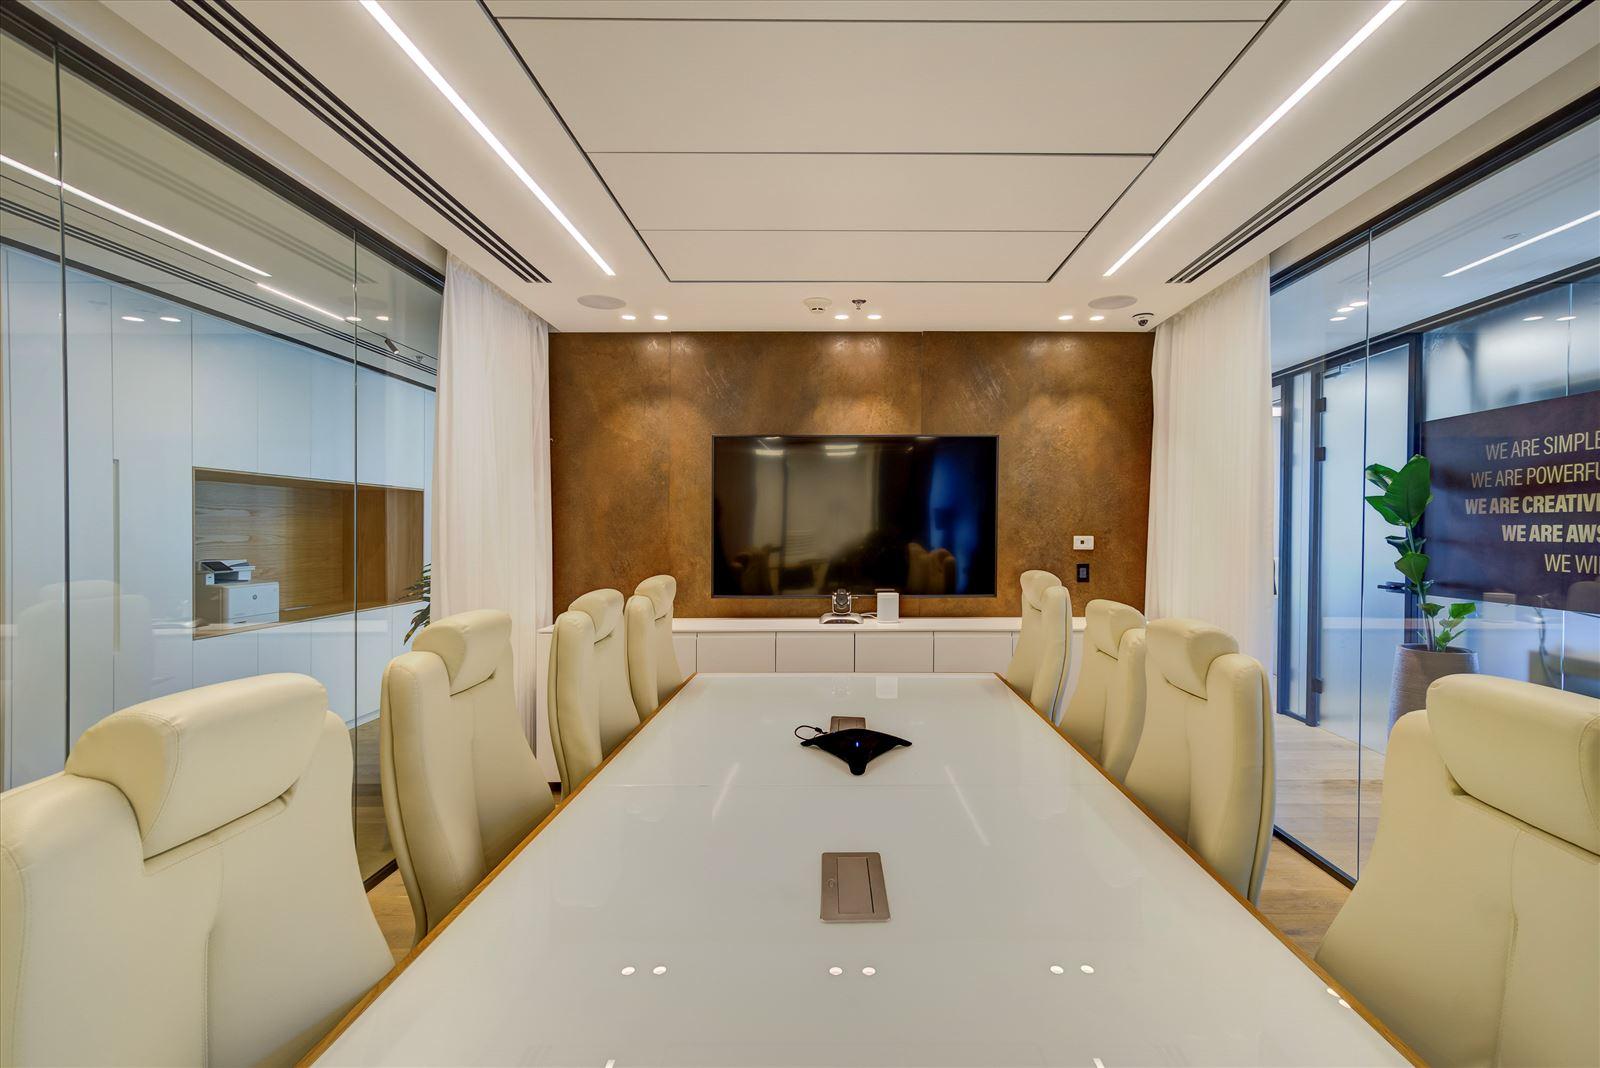 Pi Technology Office - תאורה מבית דורי קמחי בחדר הישיבות